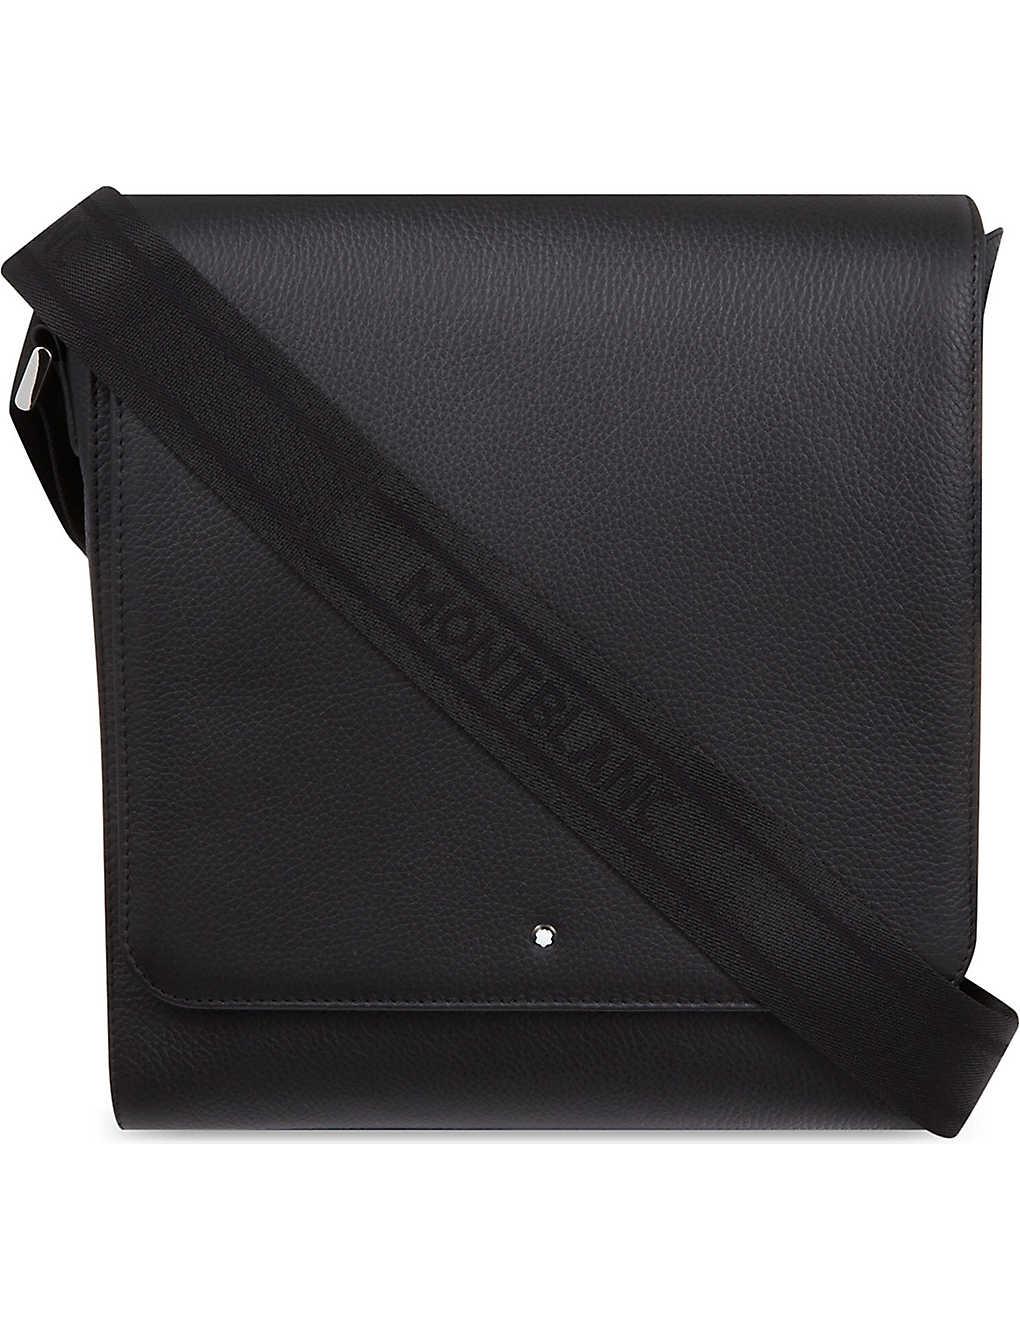 MONTBLANC - Meisterstück leather north south bag   Selfridges.com 272a469e46